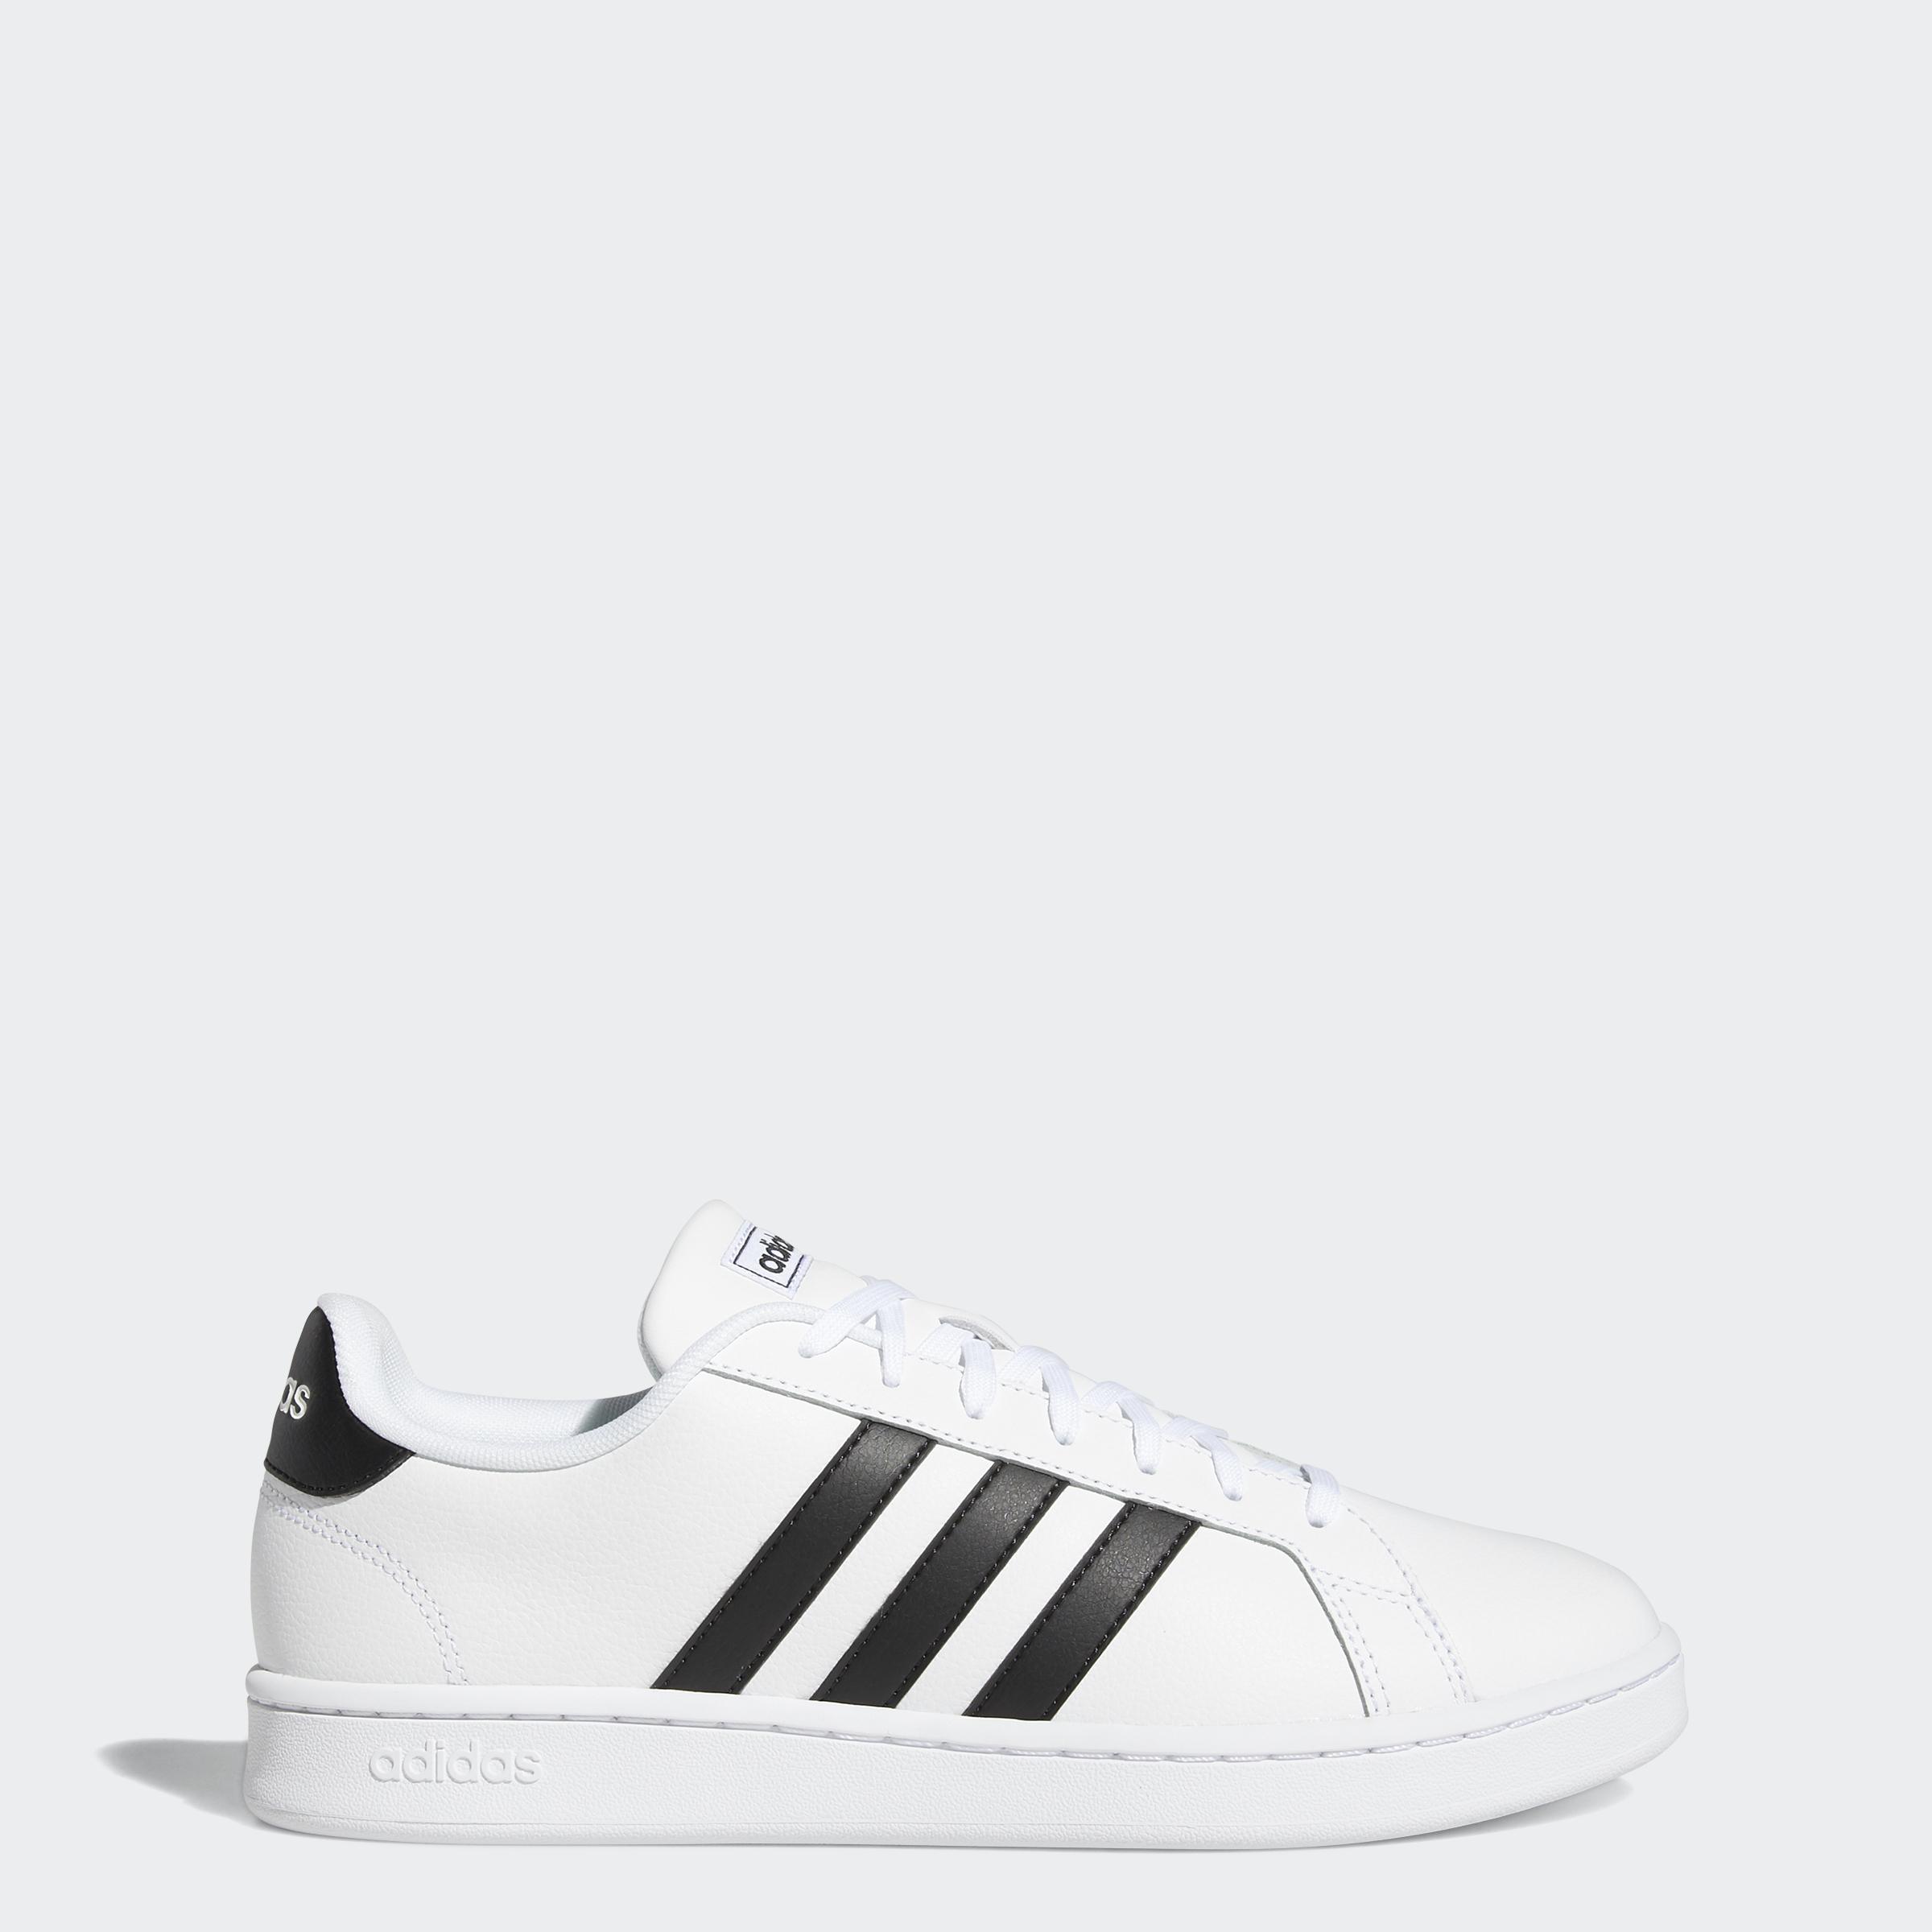 adidas-Originals-Grand-Court-Shoes-Men-039-s thumbnail 19